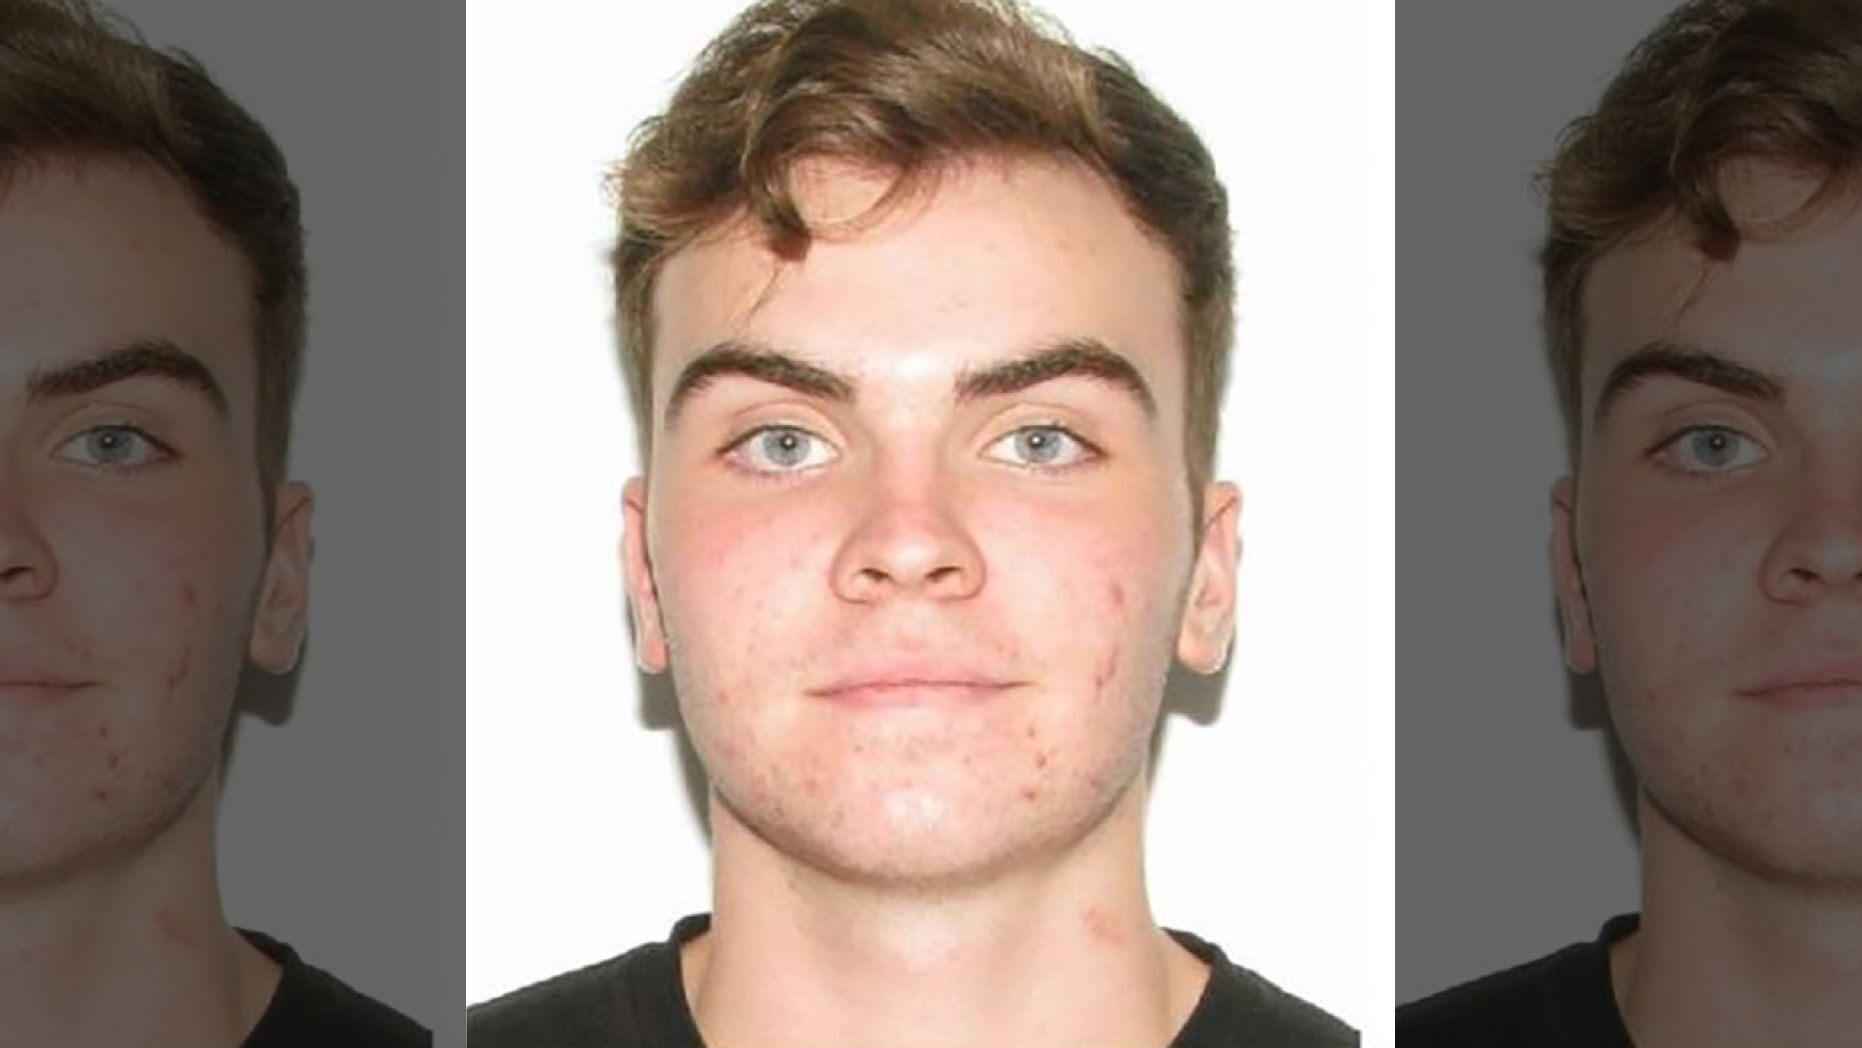 Brampton sex assault suspect turns himself in after video